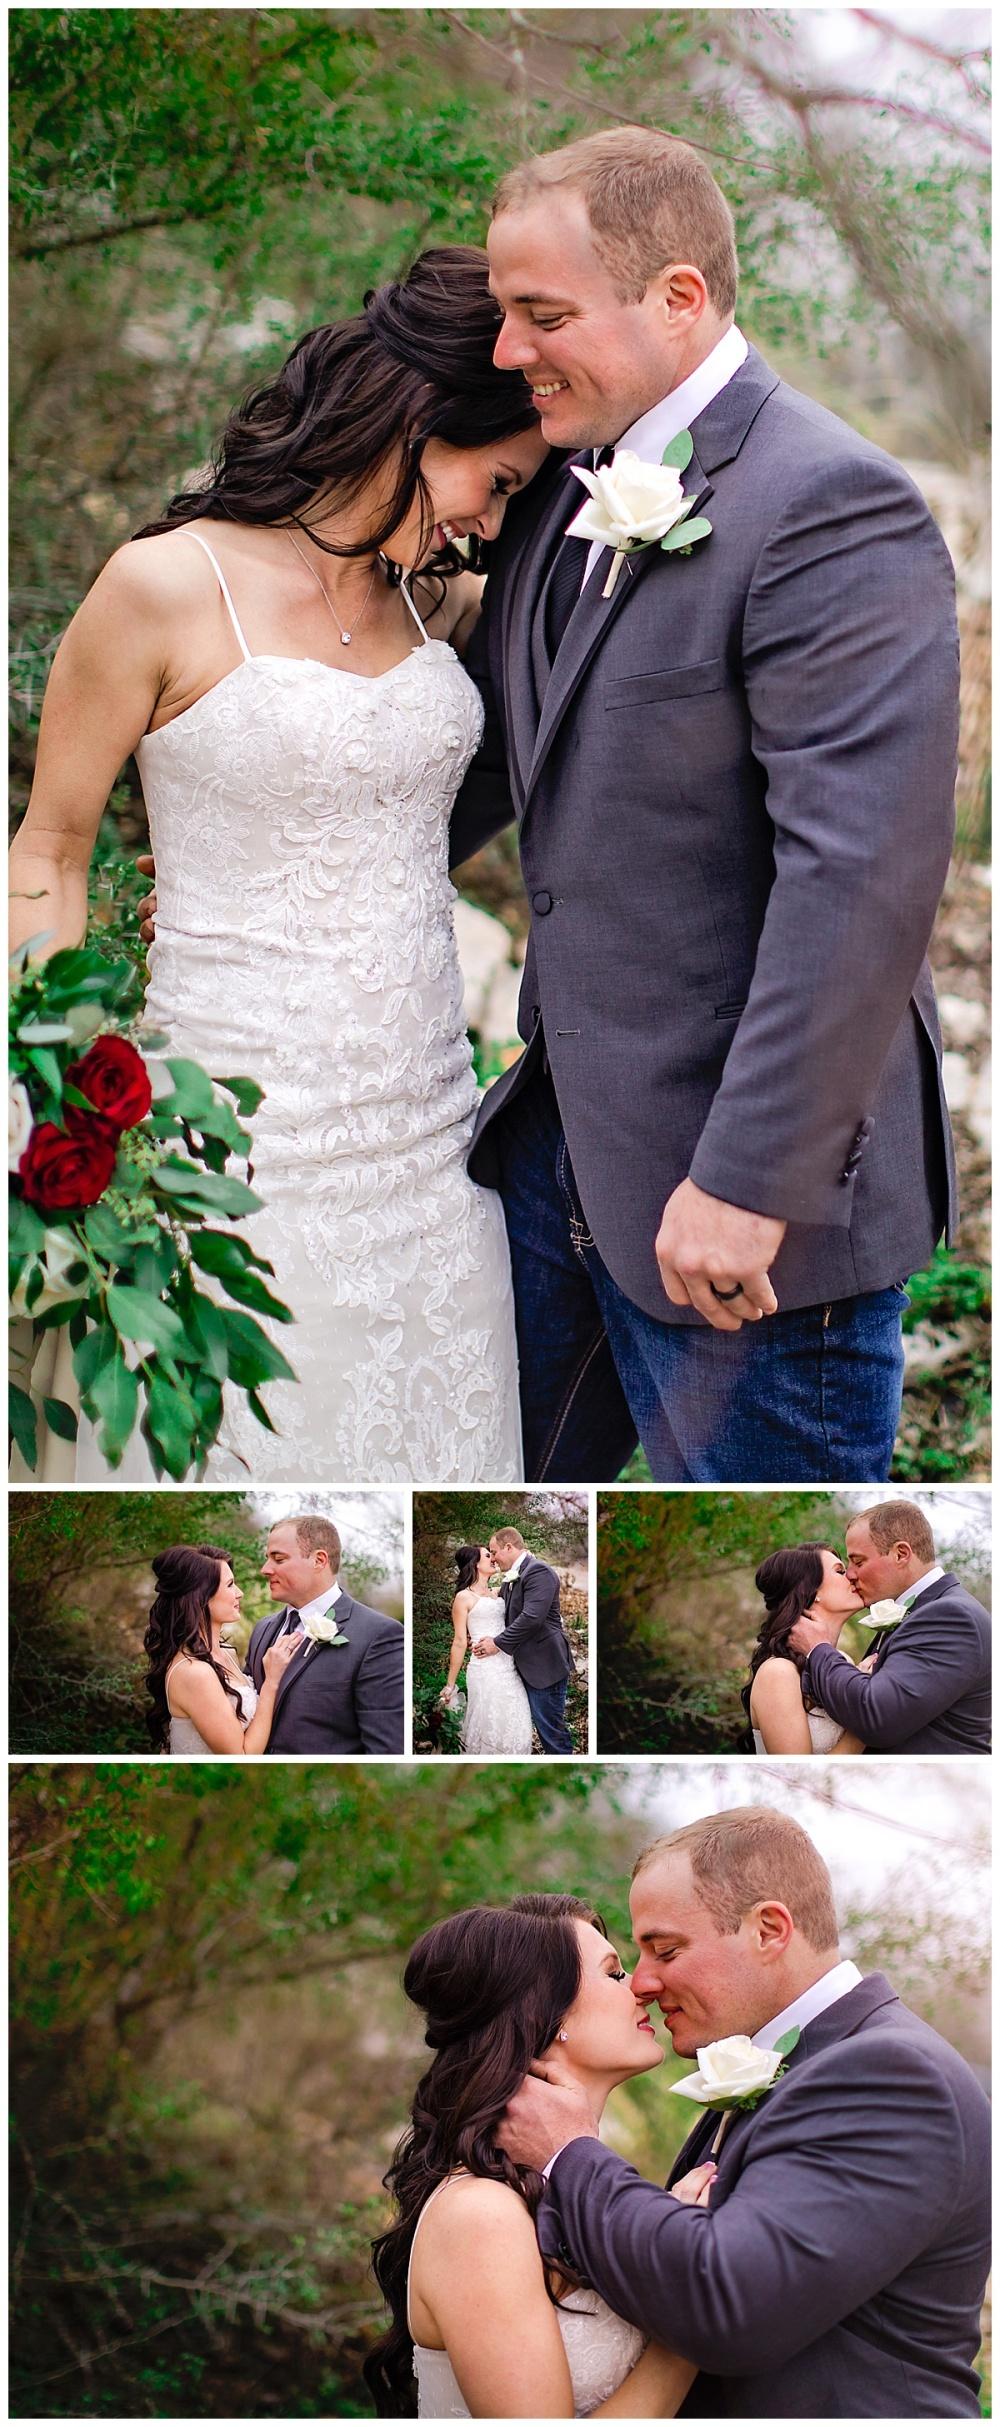 Carly-Barton-Photography-Geronimo-Oaks-Wedding-Venue-Texas-Hill-Country-Ronnie-Sarah_0070.jpg